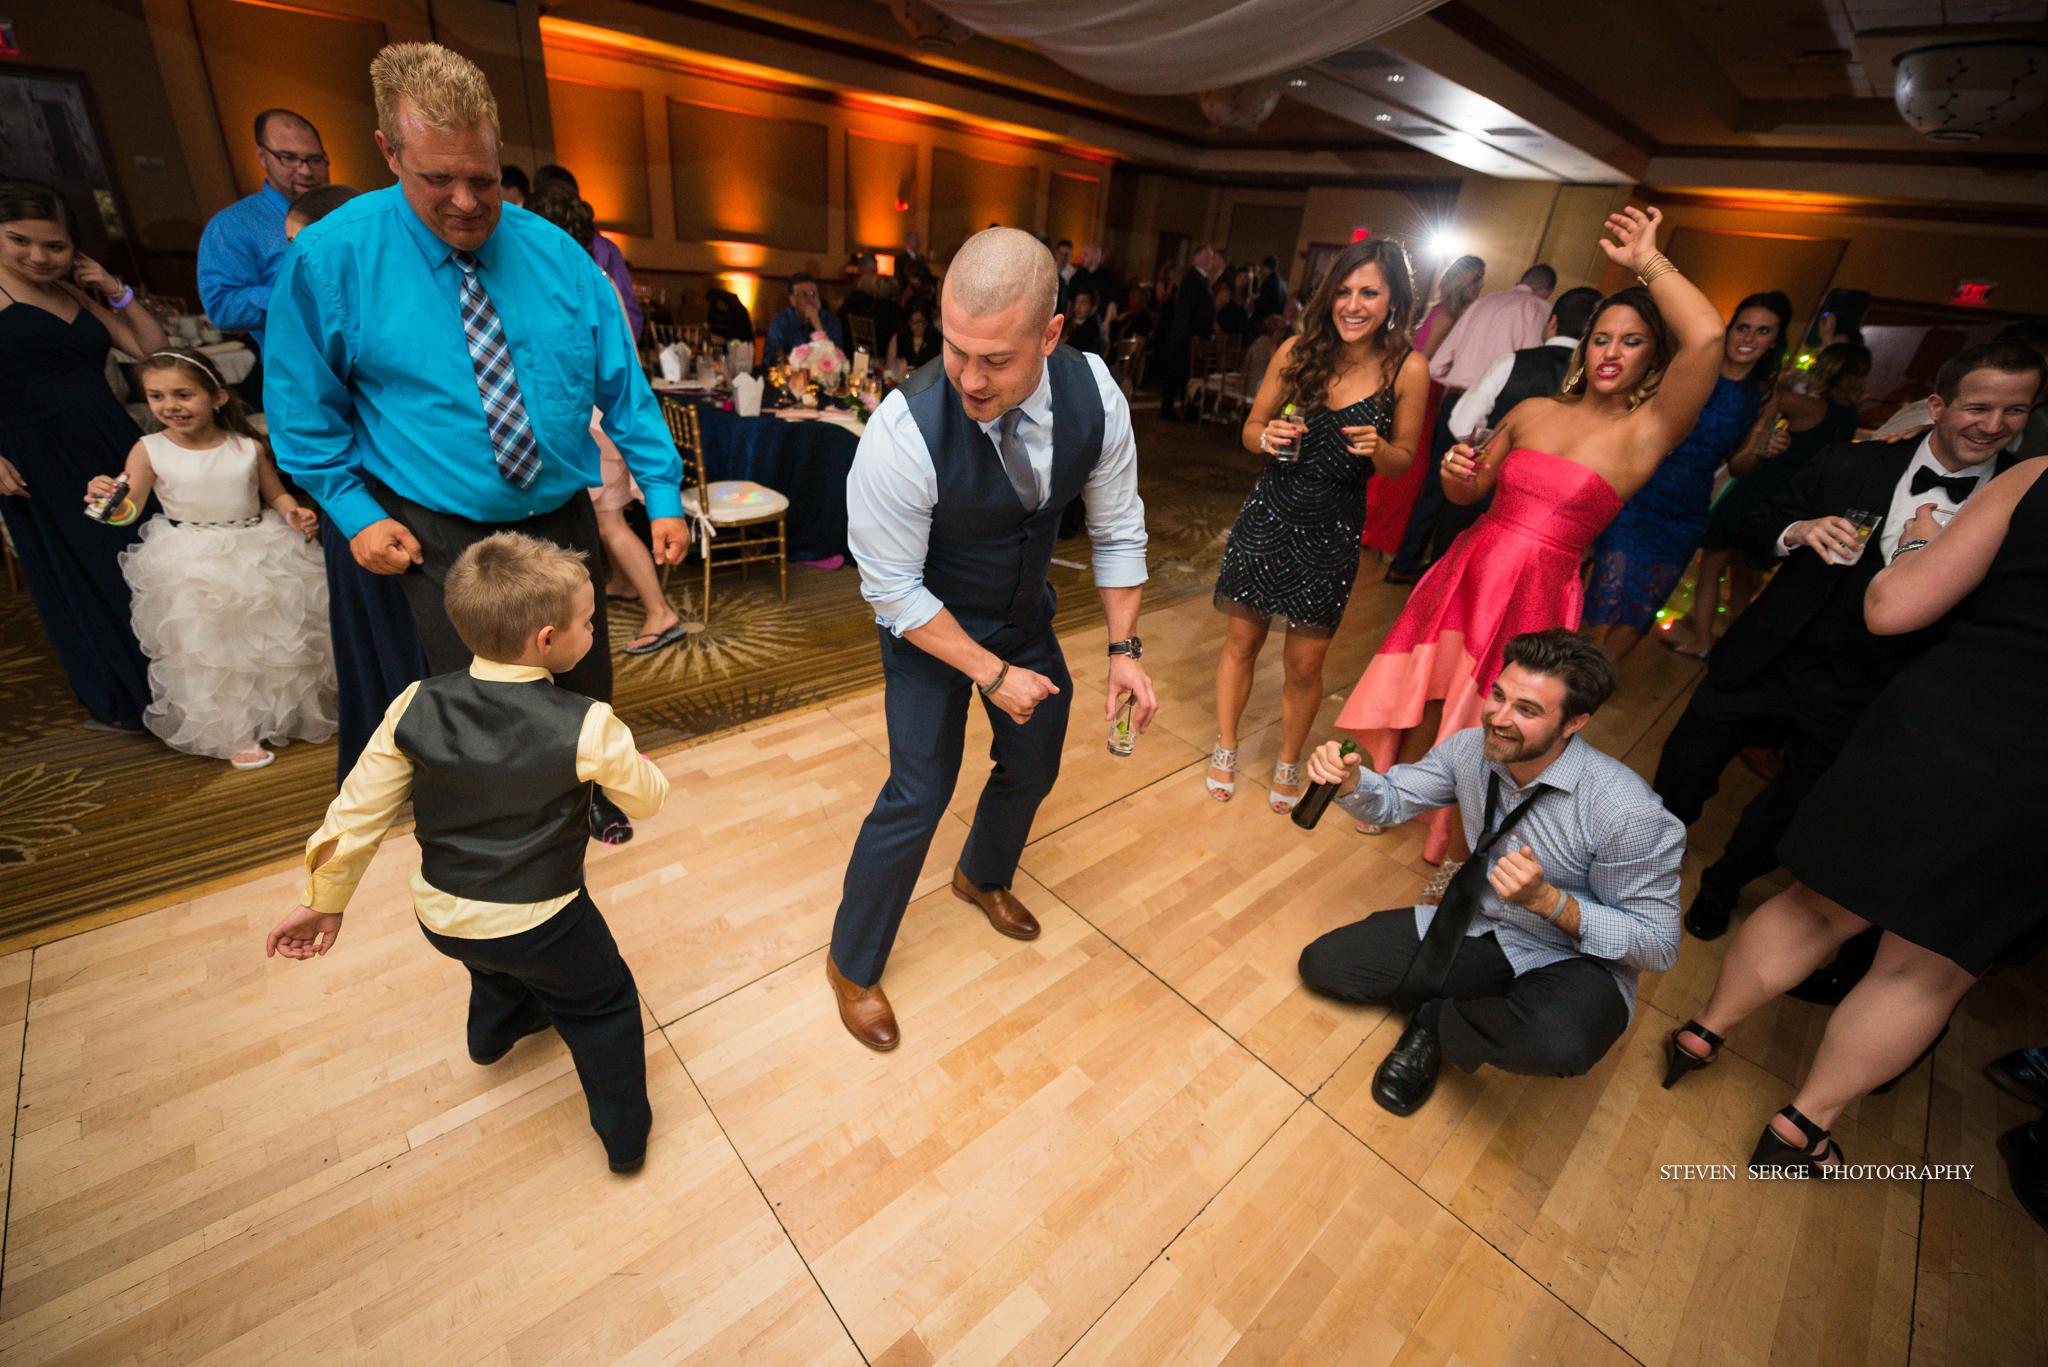 scranton-wedding-photographers-hilton-steven-serge-photography-30.jpg